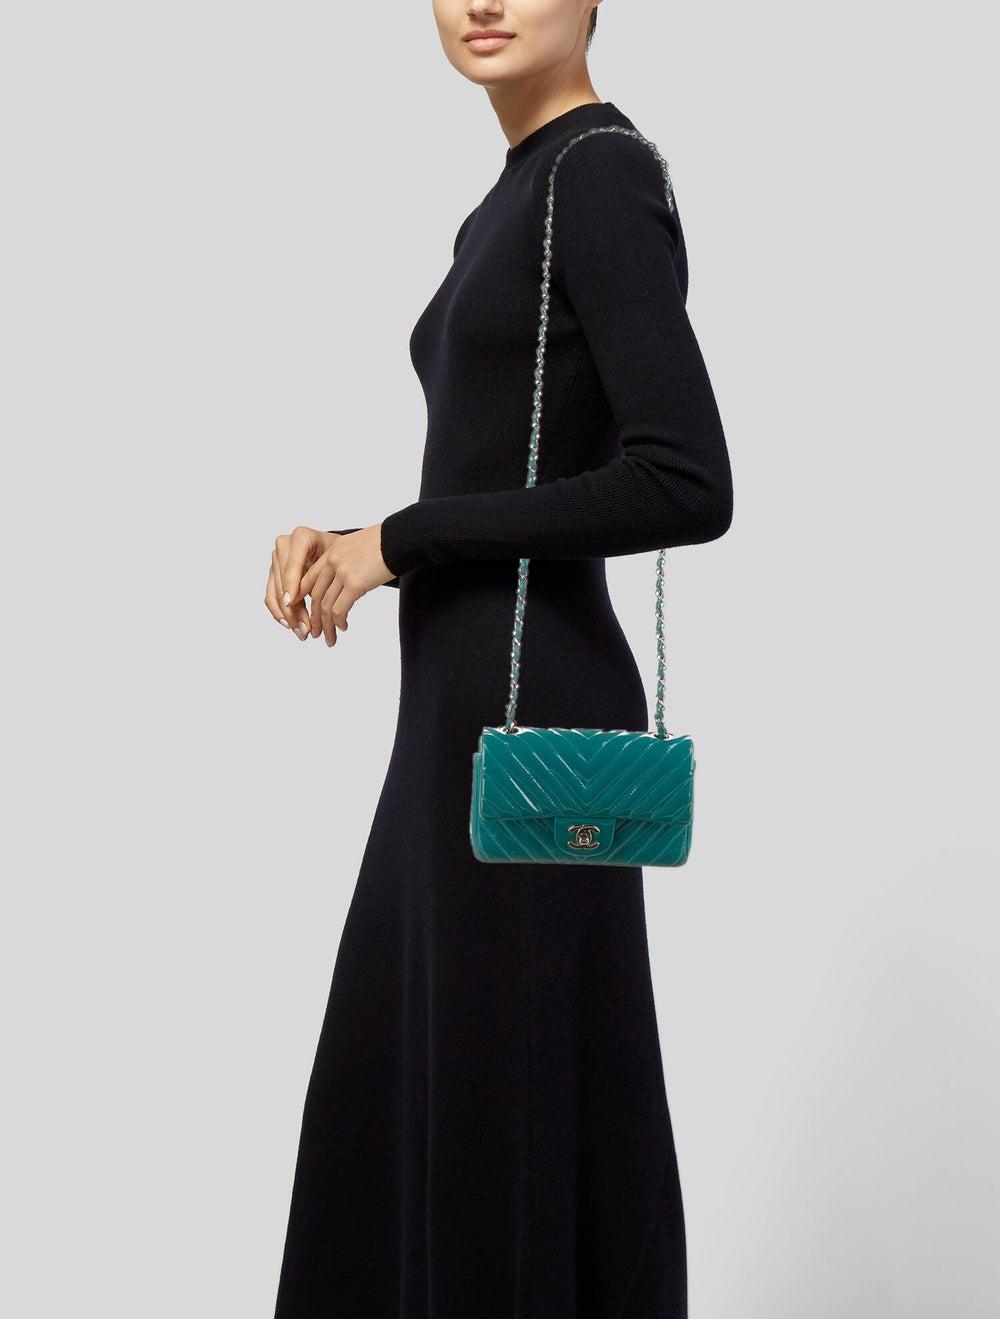 Chanel Classic New Mini Chevron Flap Bag Blue - image 2